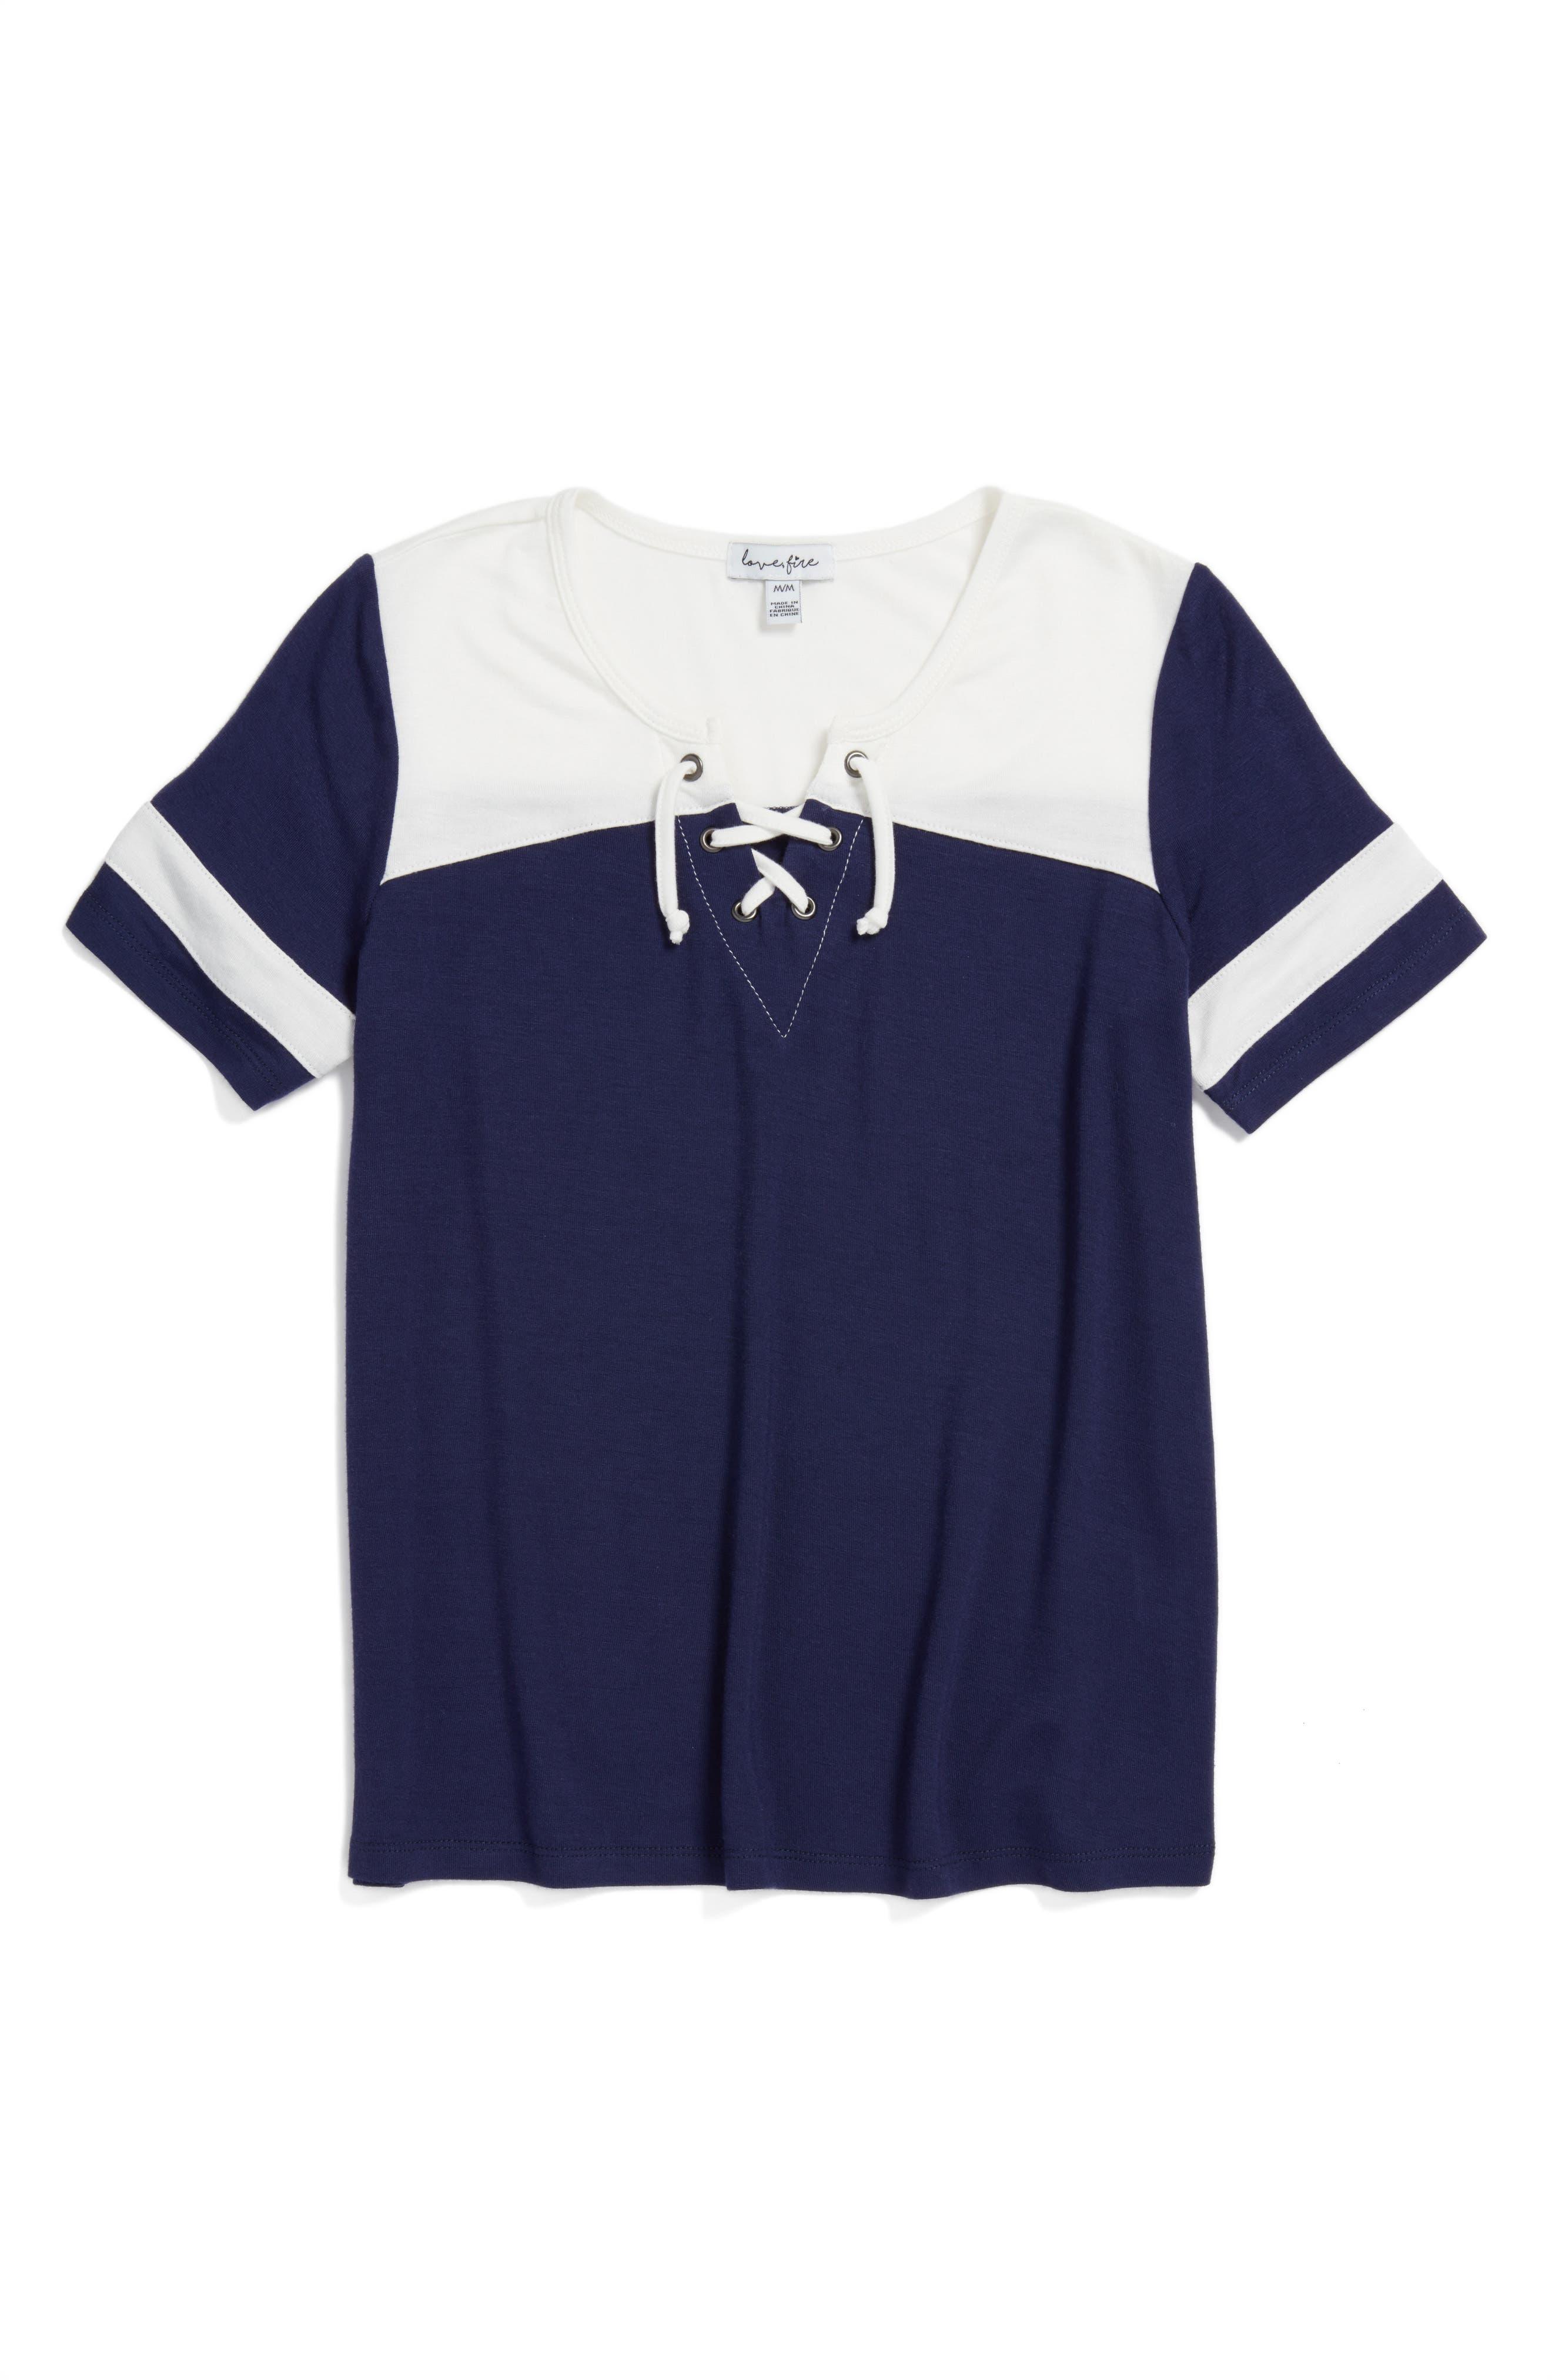 Main Image - Love, Fire Varsity Baseball Tee (Big Girls)